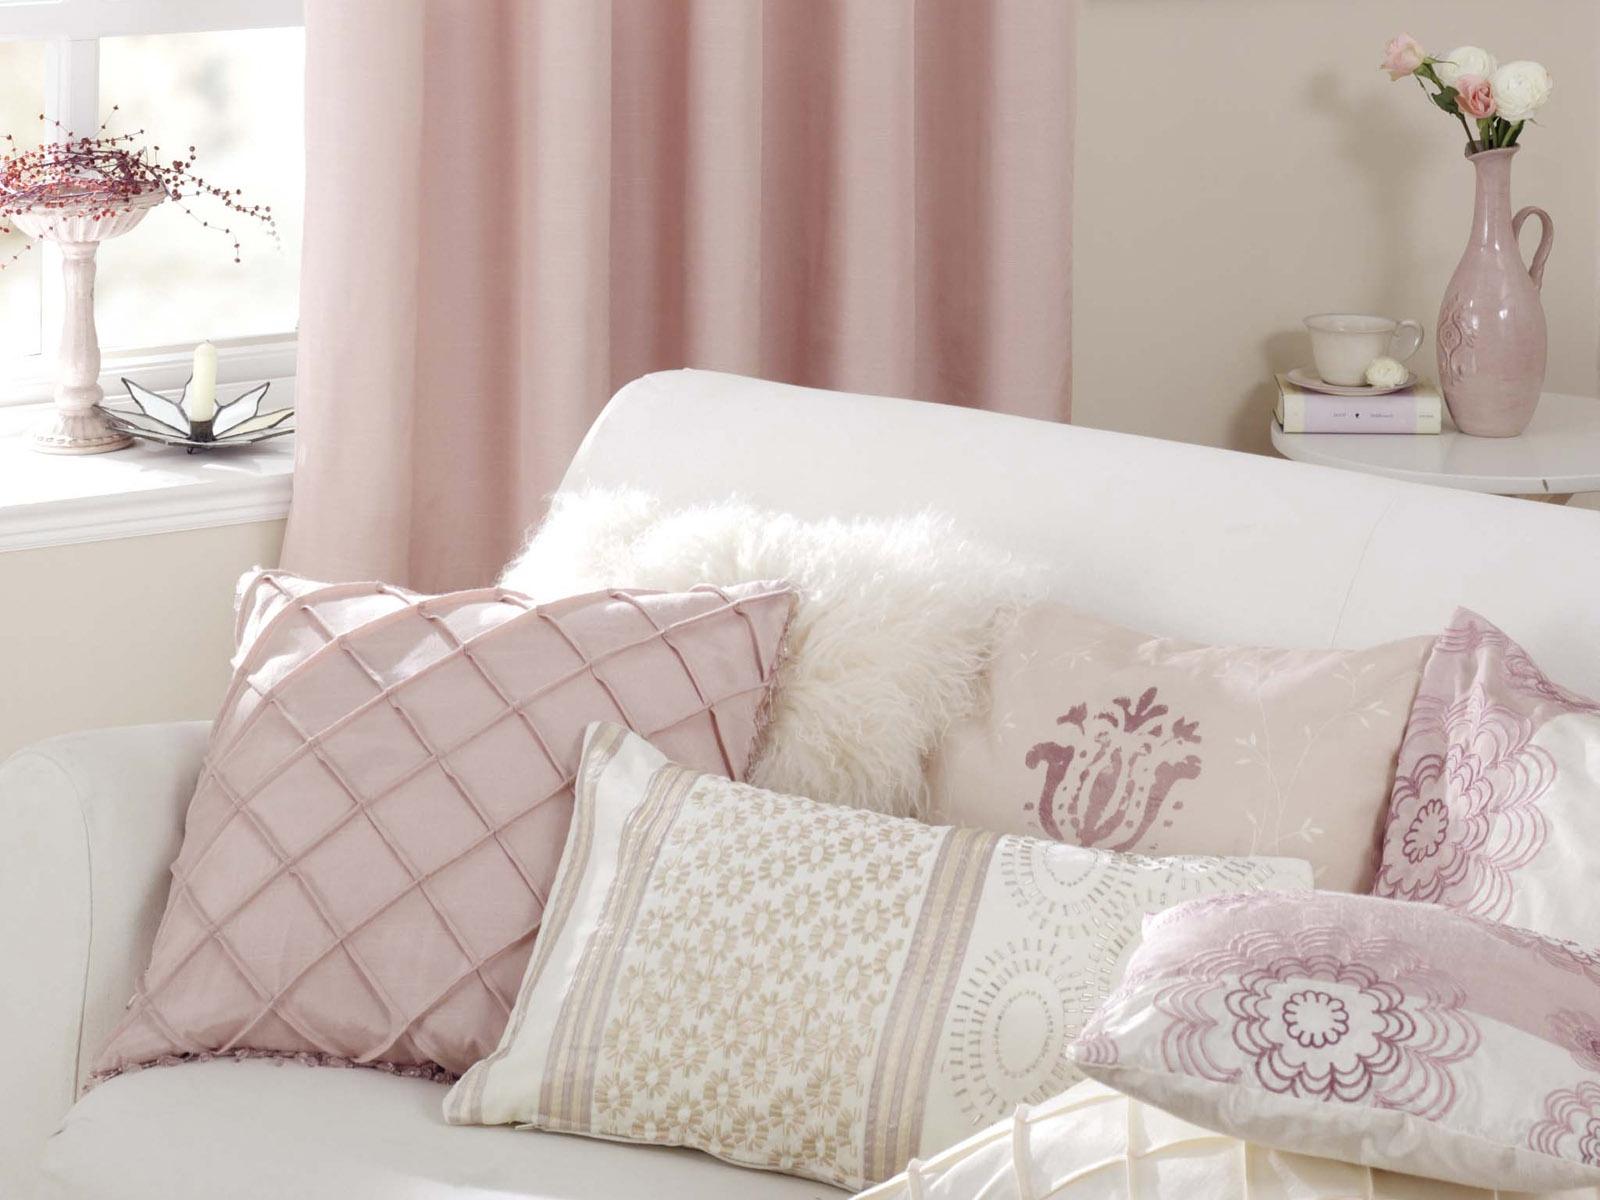 hintergrundbilder zimmer bett rosa innenarchitektur licht sofa material m bel textil. Black Bedroom Furniture Sets. Home Design Ideas